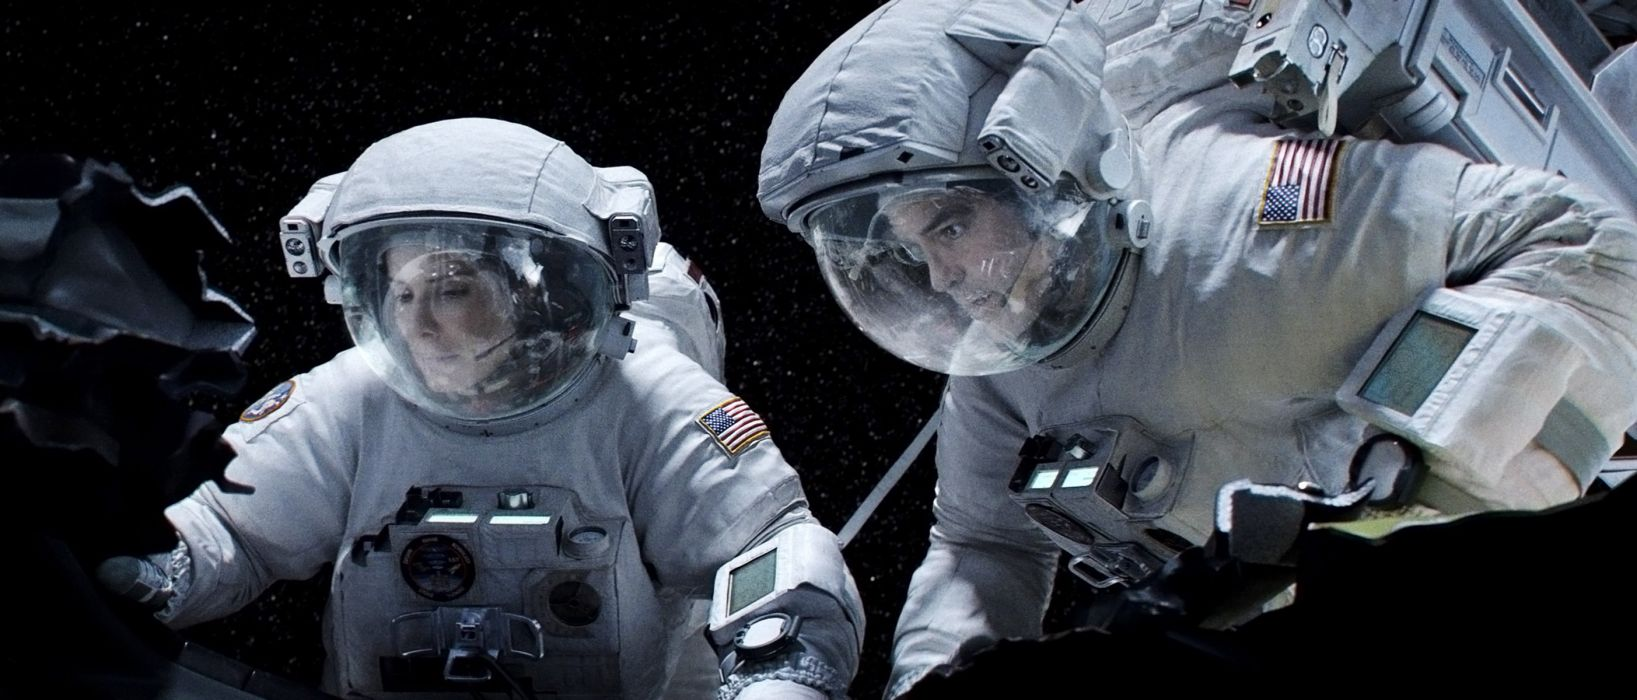 GRAVITY drama sci-fi thriller space astronaut  r wallpaper